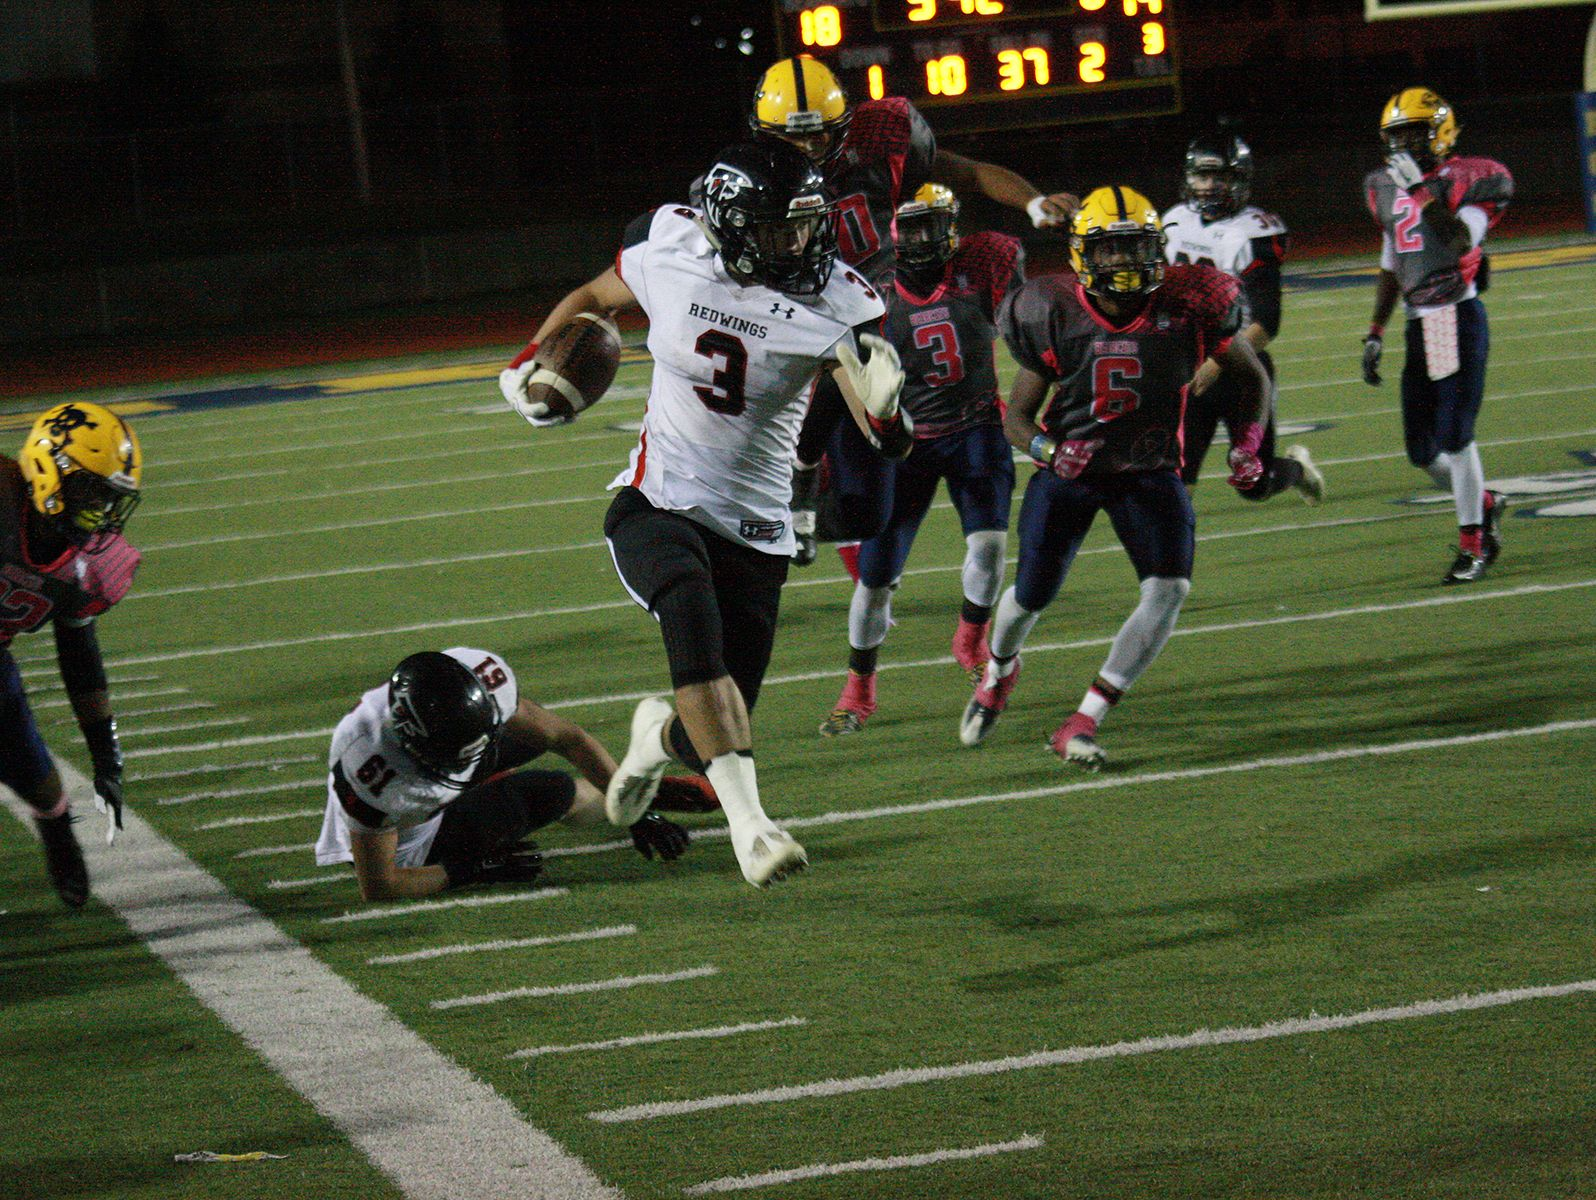 St. John's Jack Bouck scores a 63-yard touchdown reception against Battle Creek Central on Friday.